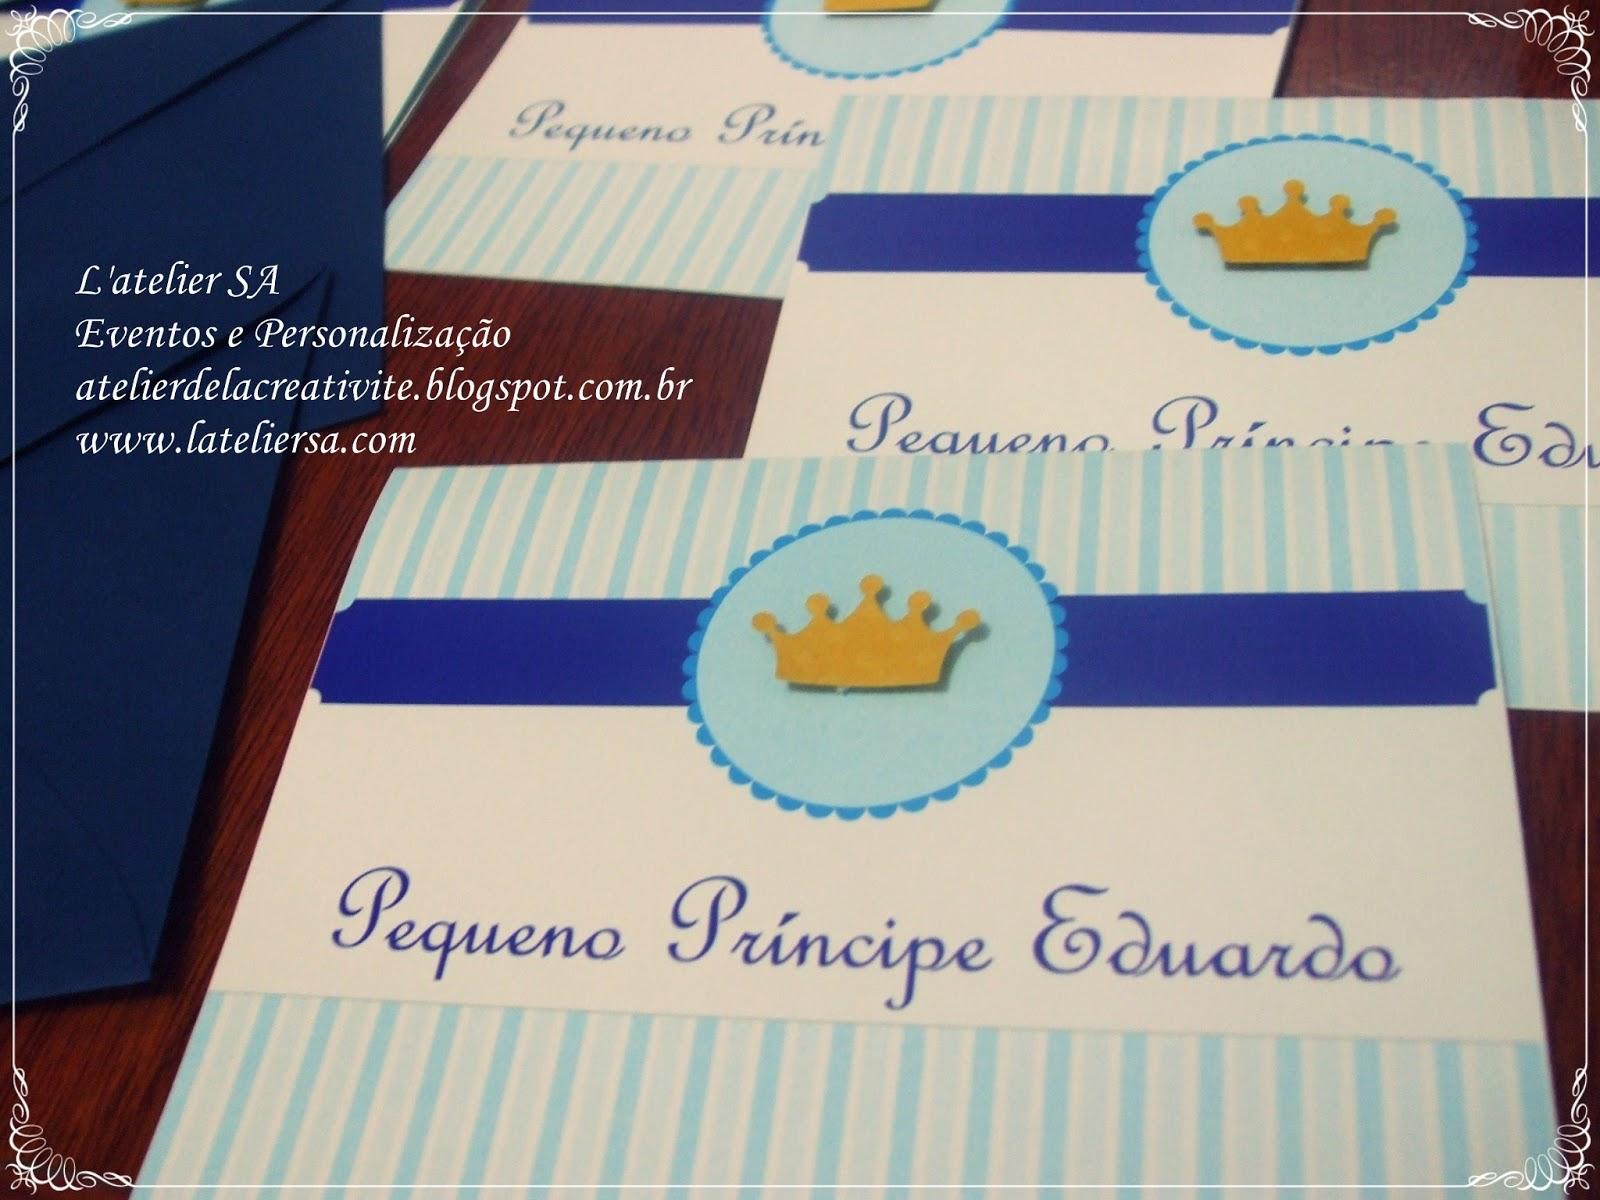 Convites Para Aniversario De 1 Ano Pequeno Principe Convite